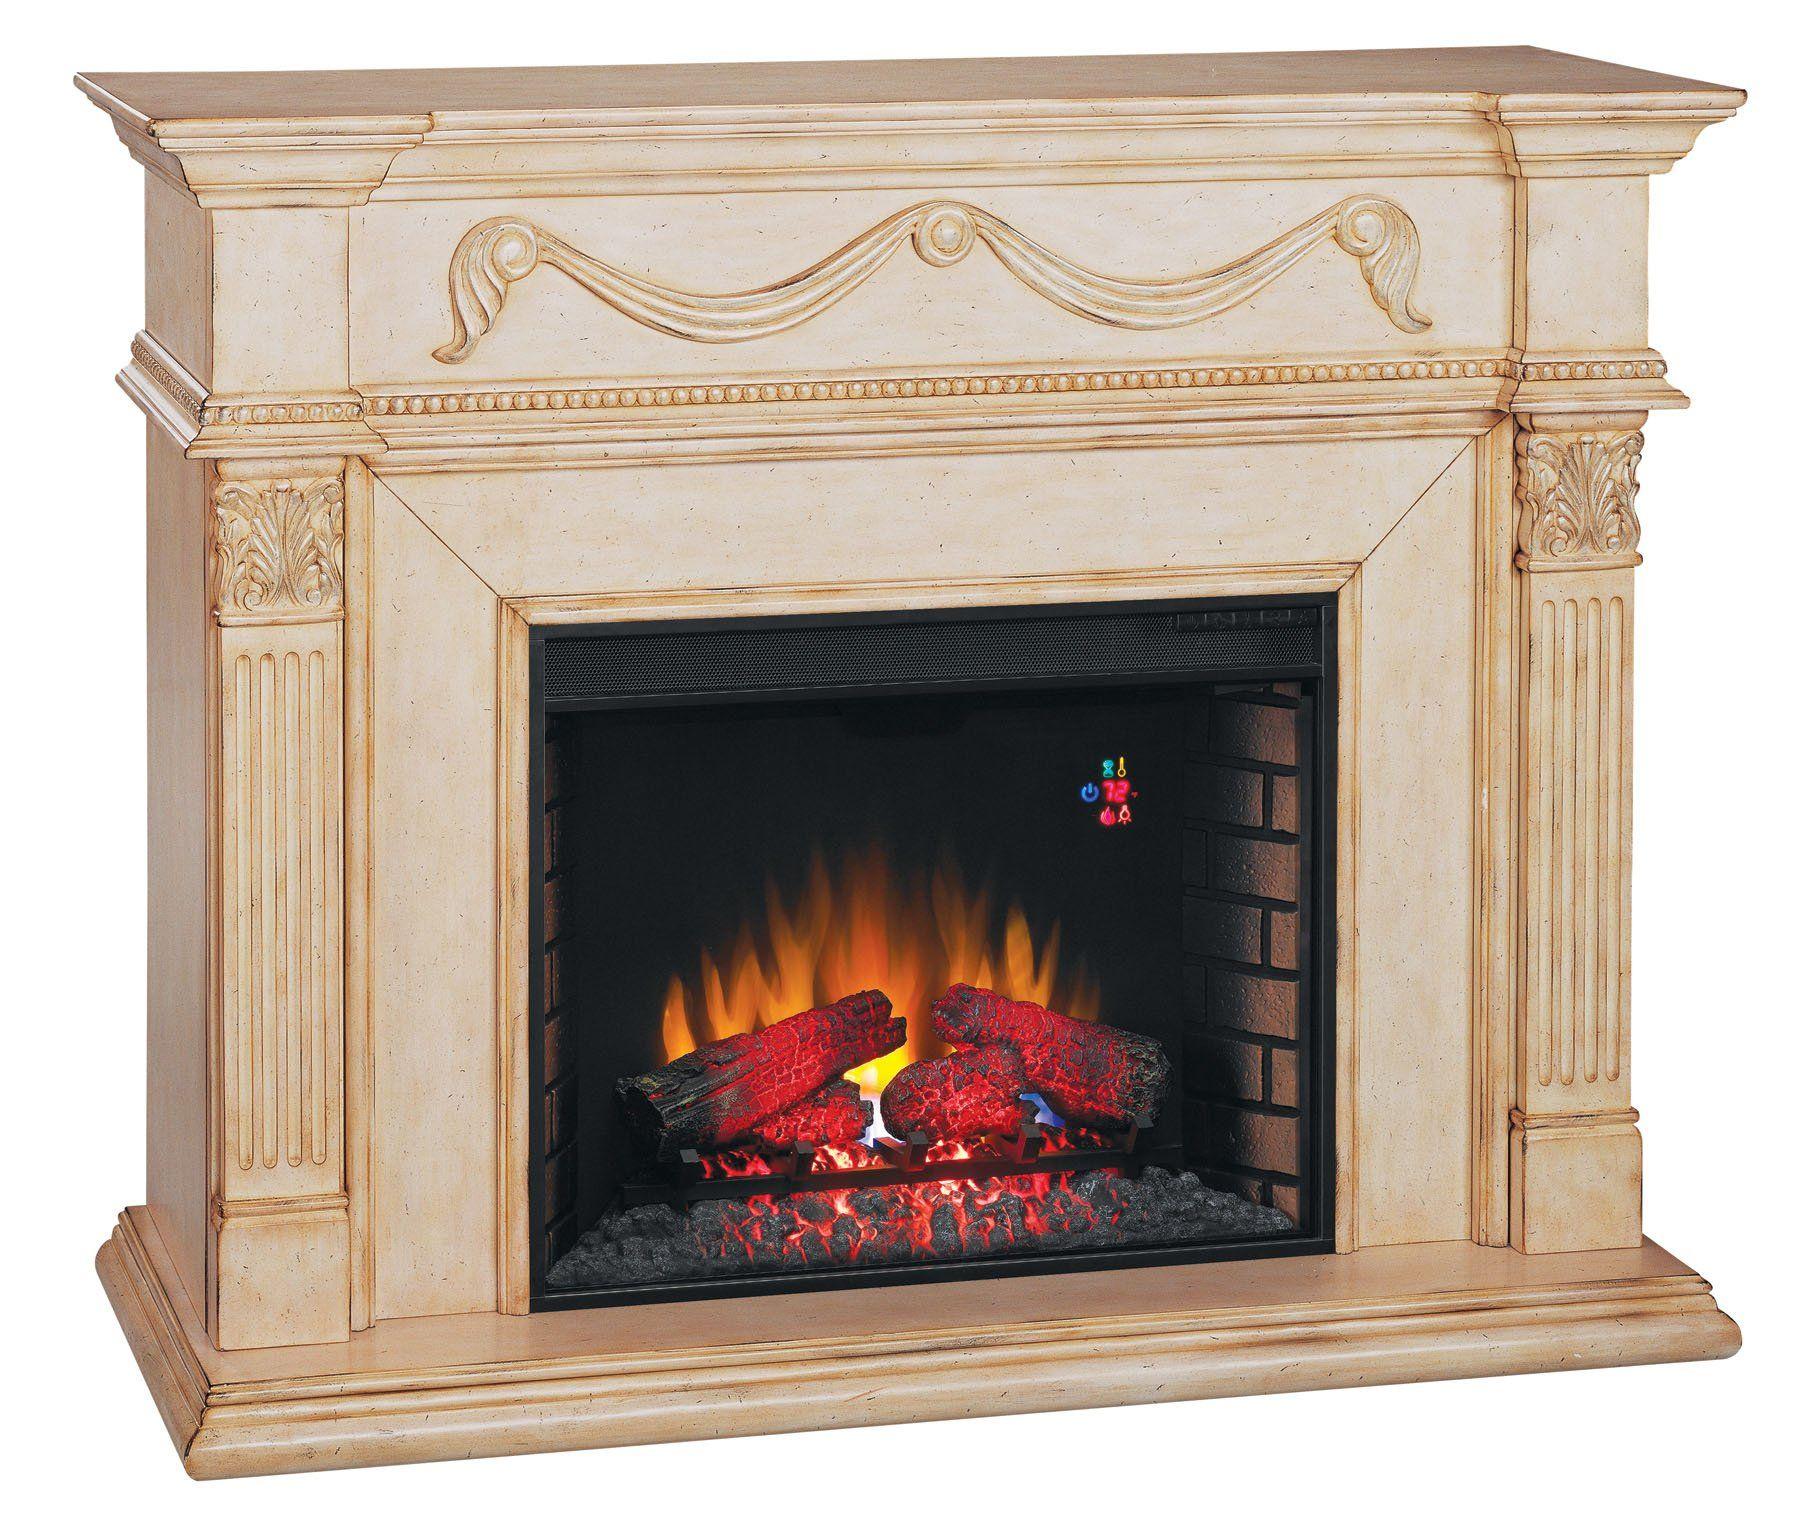 Classicflame Gossamer Wall Fireplace Mantel Antique